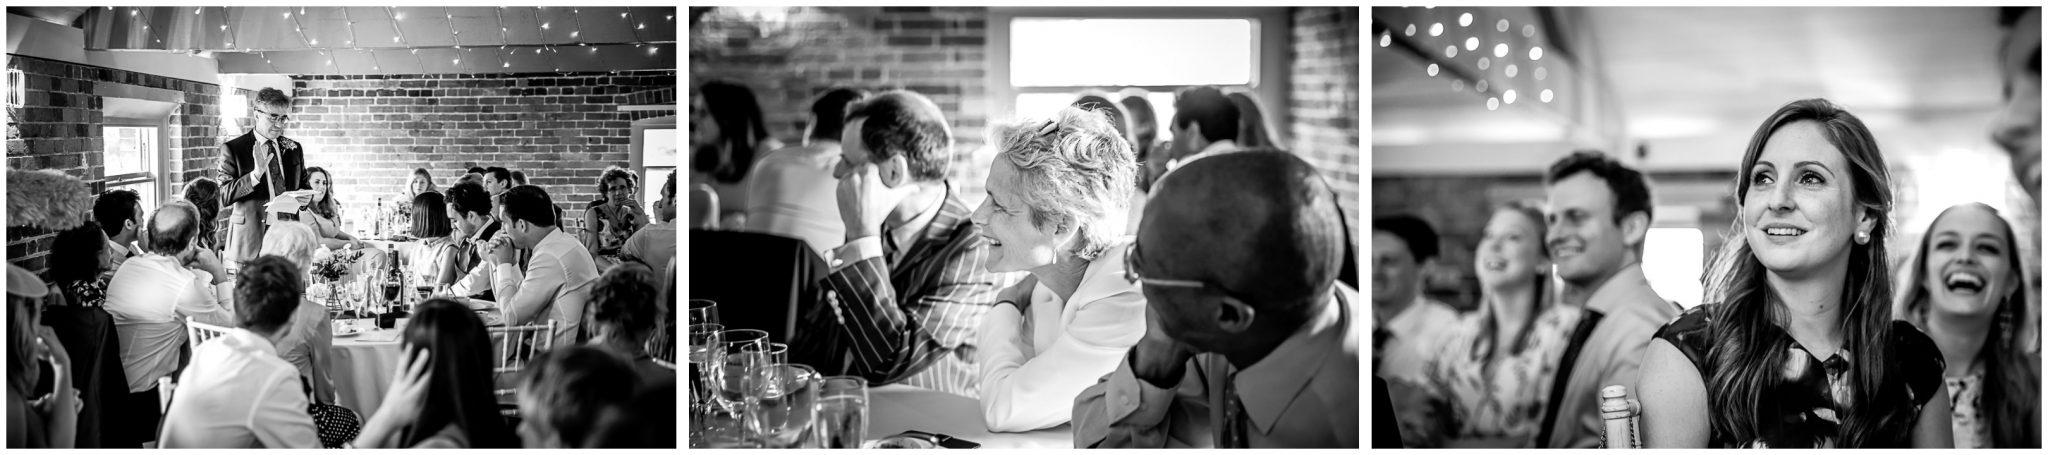 Sopley Mill Summer wedding guests watch speeches